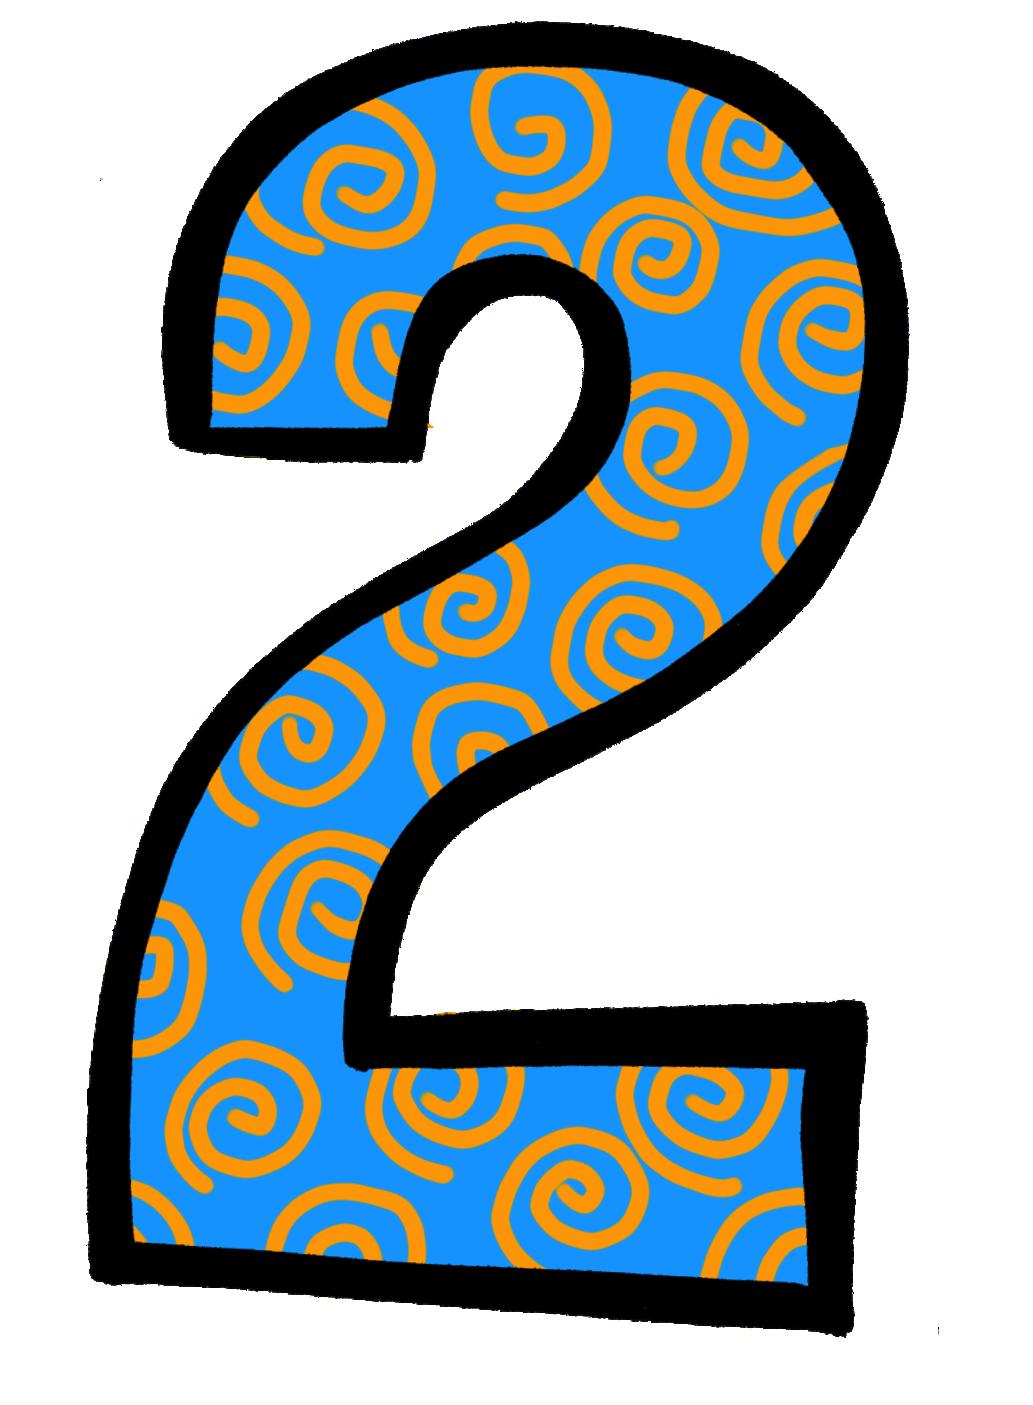 1033x1405 Button clipart number 2 | Clip art, Free clip art, Symbols